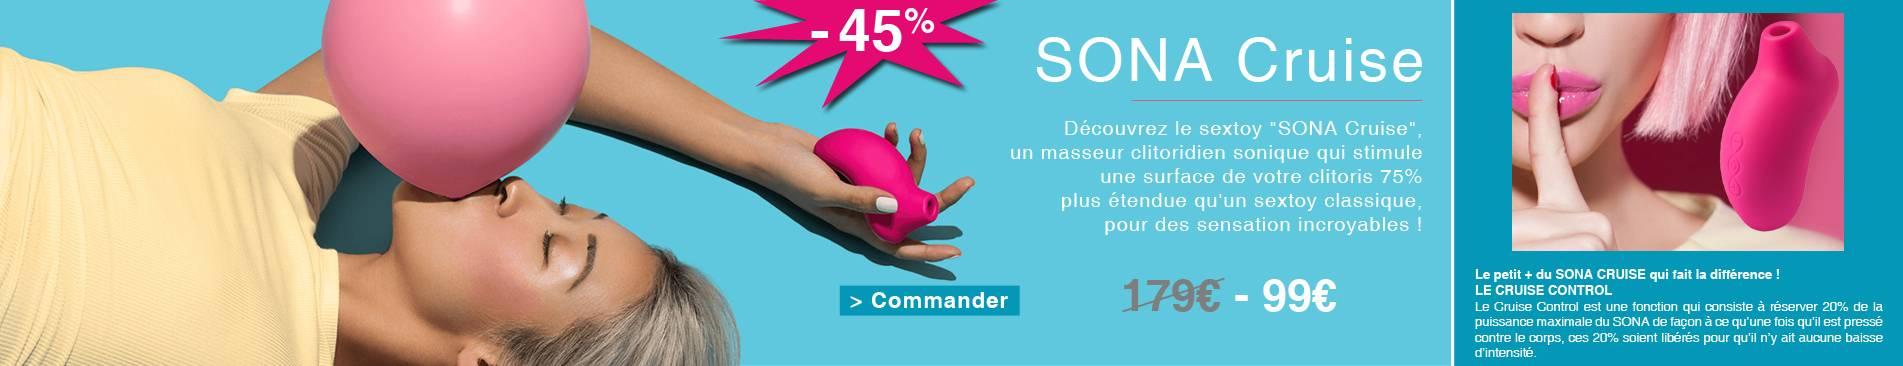 Sona Cruise à 99€ au lieu de 179€